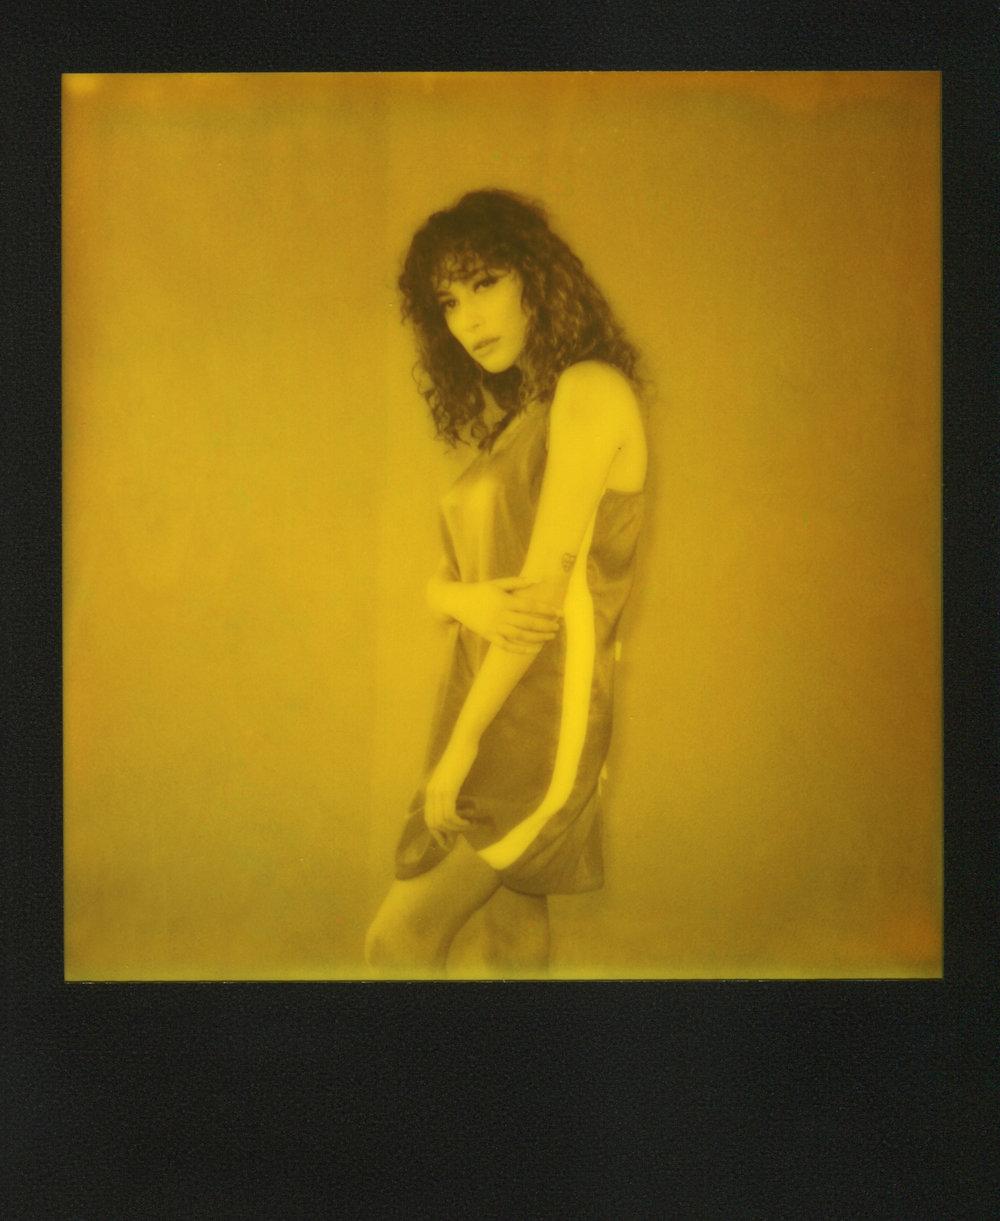 Rene-Yellow-Polaroid-casenruiz.jpg